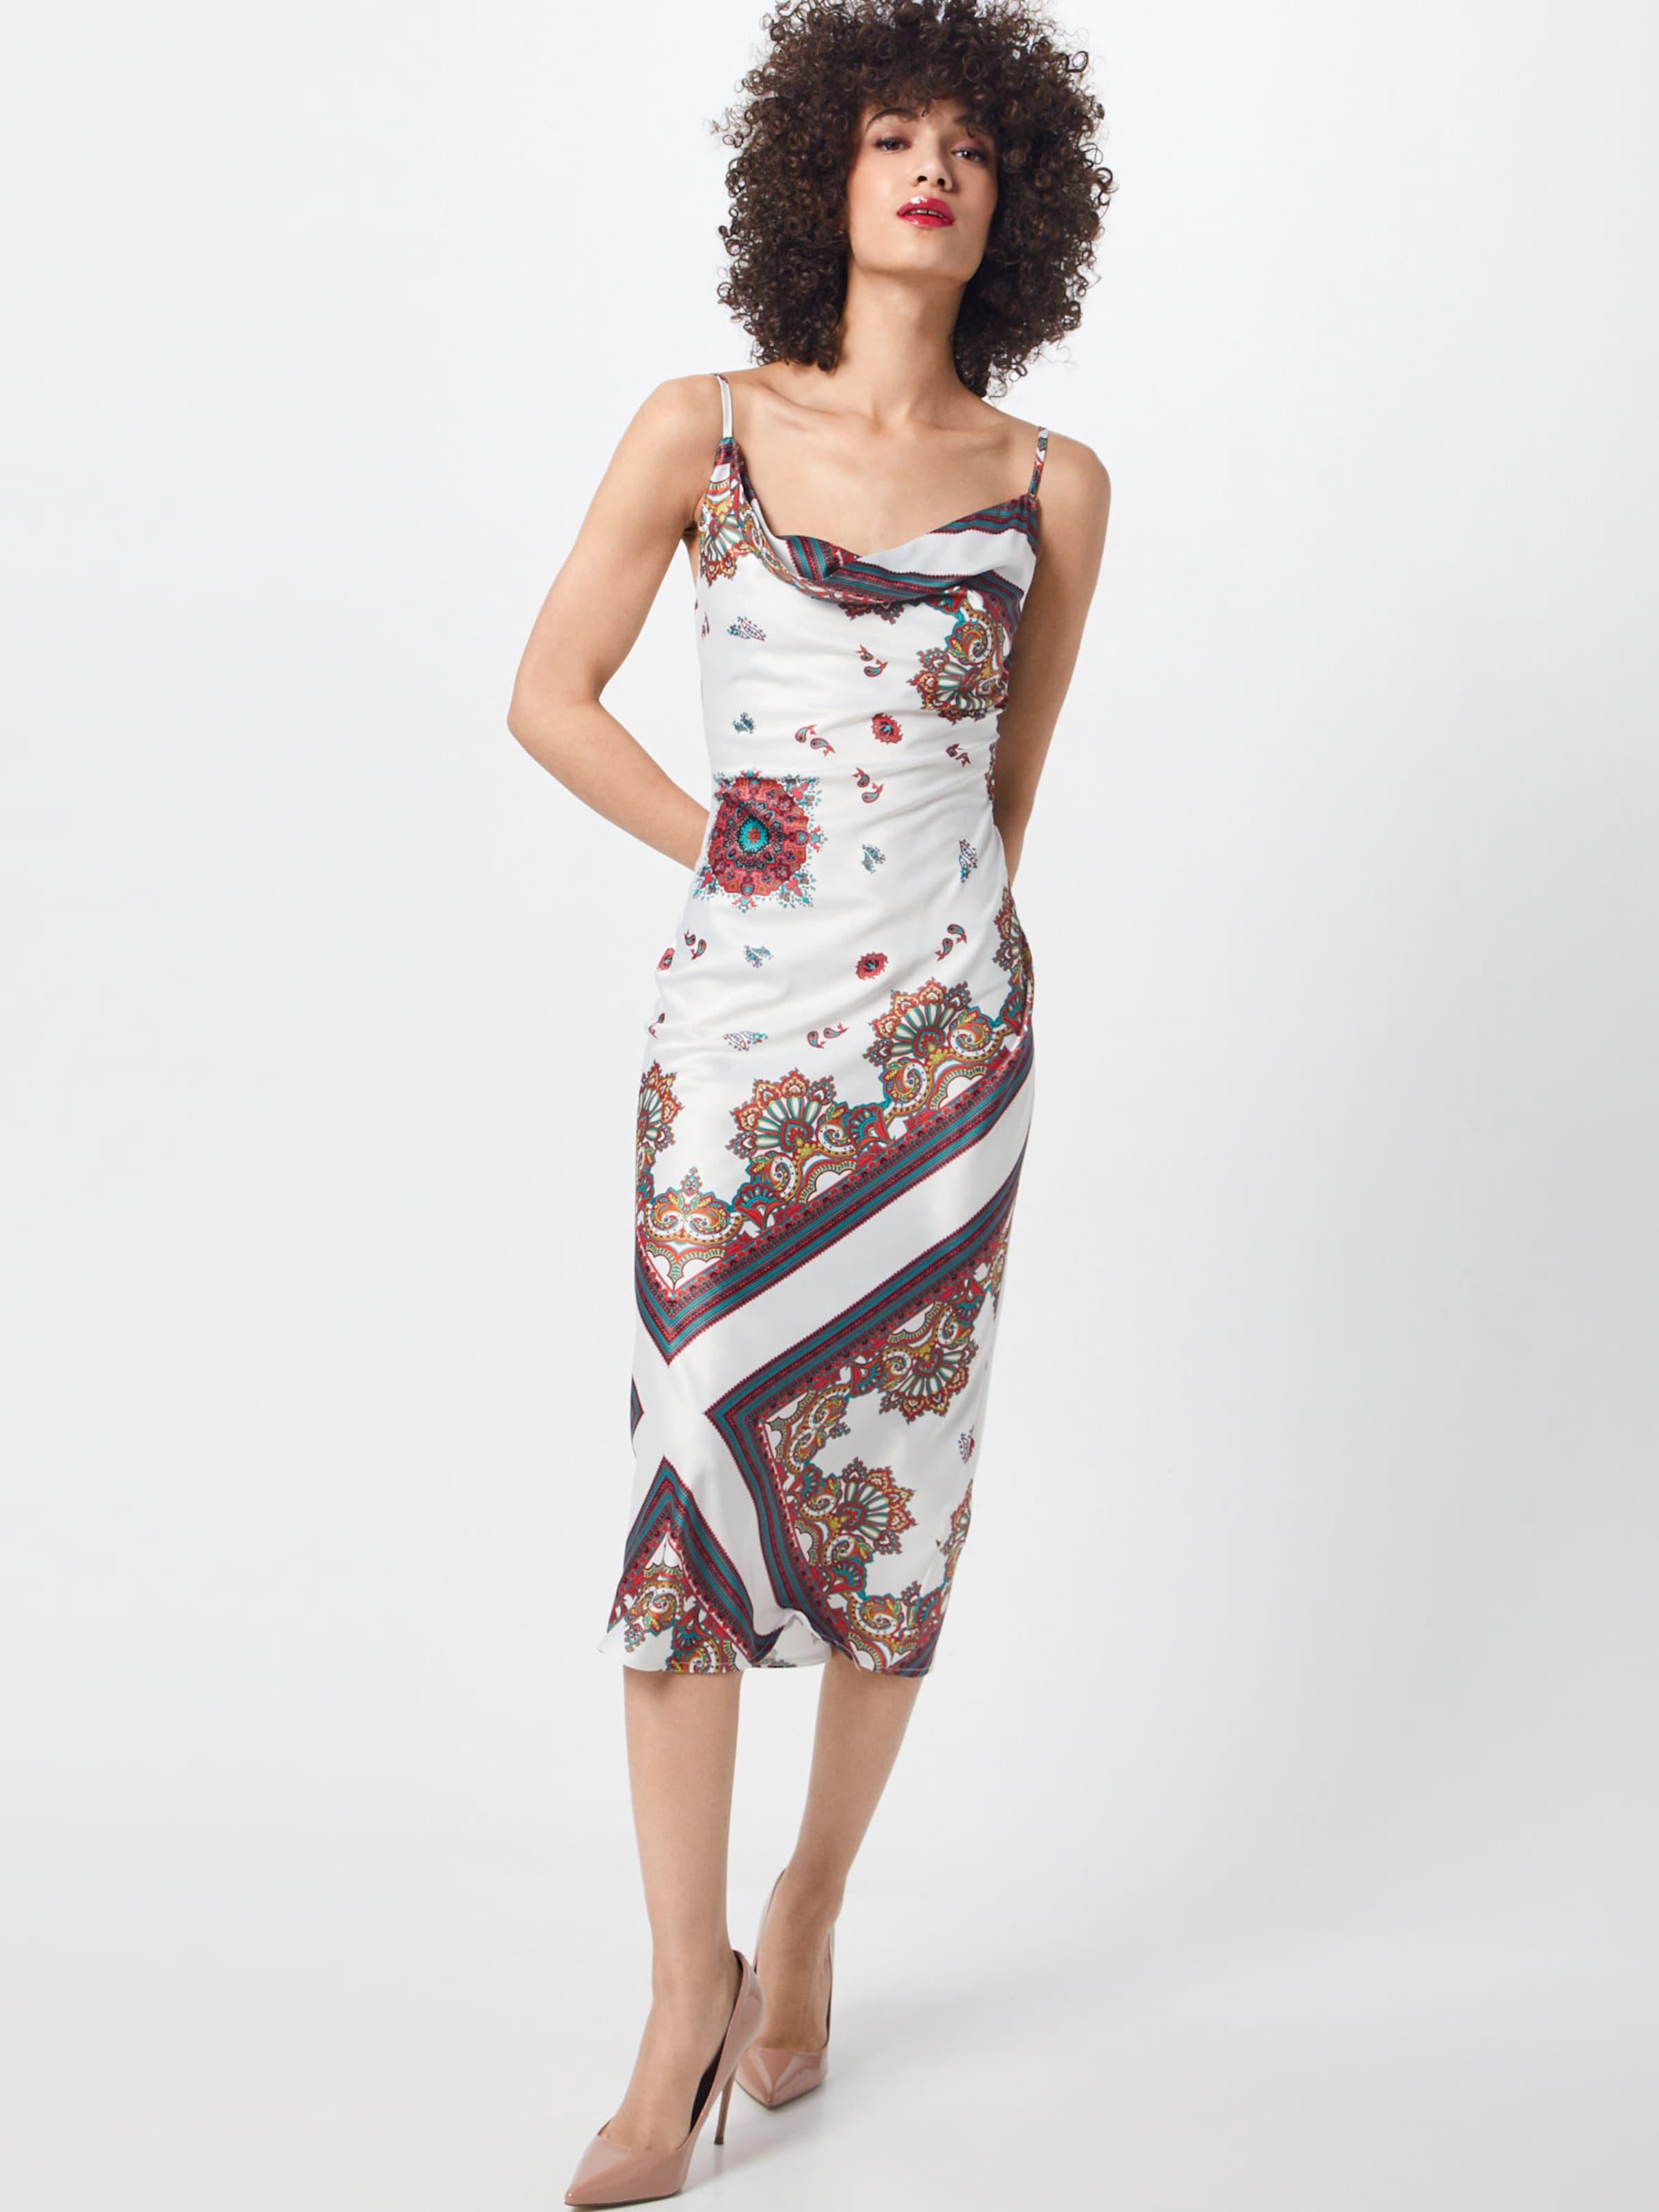 Cowl Missguided Scarf White' Print Neck Dress BraunWeiß 'satin In Kleid srBtCxhdQ